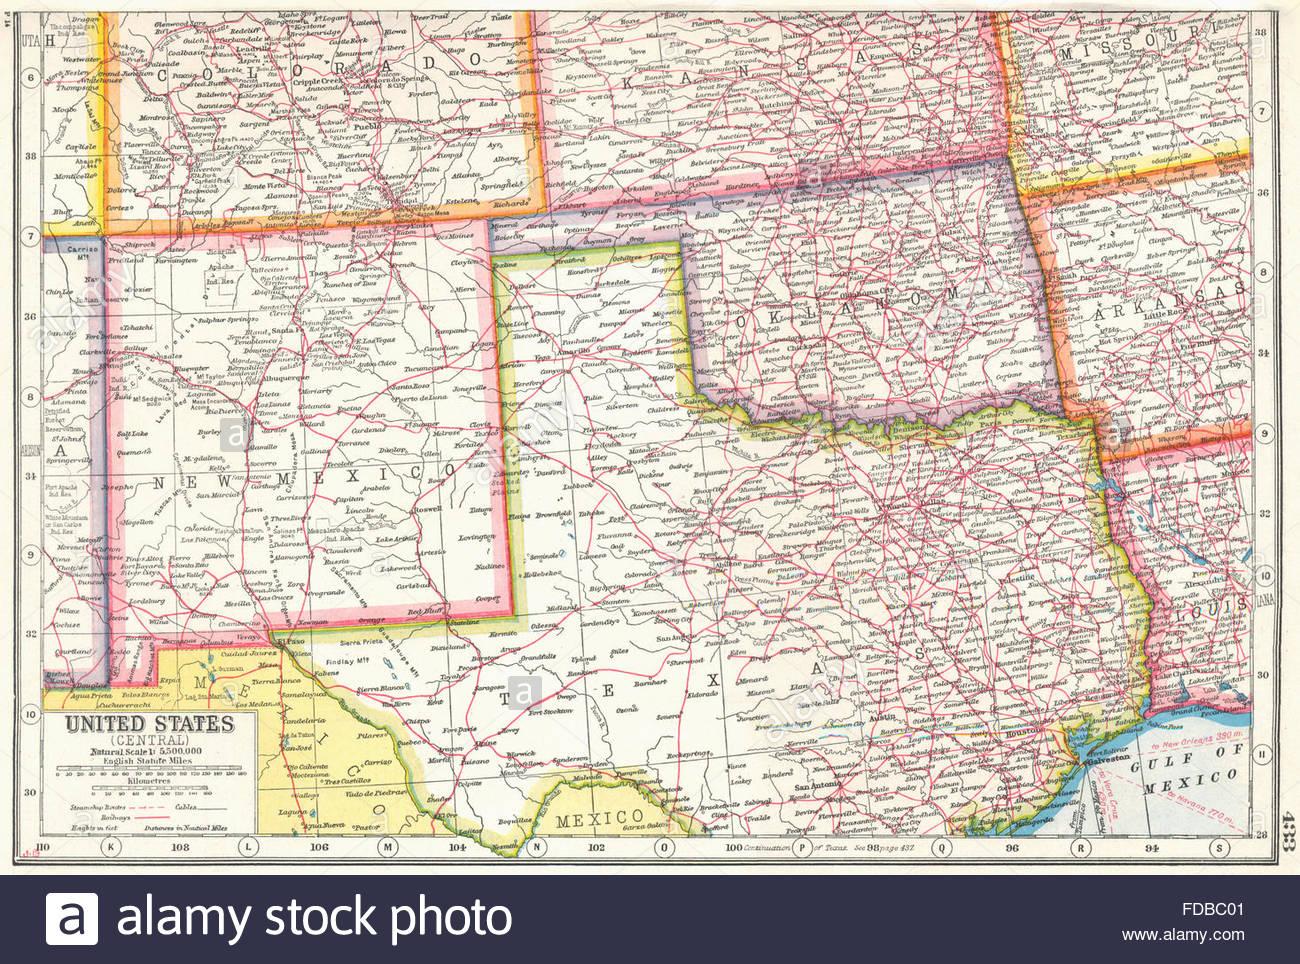 Usa South Centre: New Mexico Oklahoma North Texas. Harmsworth, 1920 - Map Of New Mexico And Texas